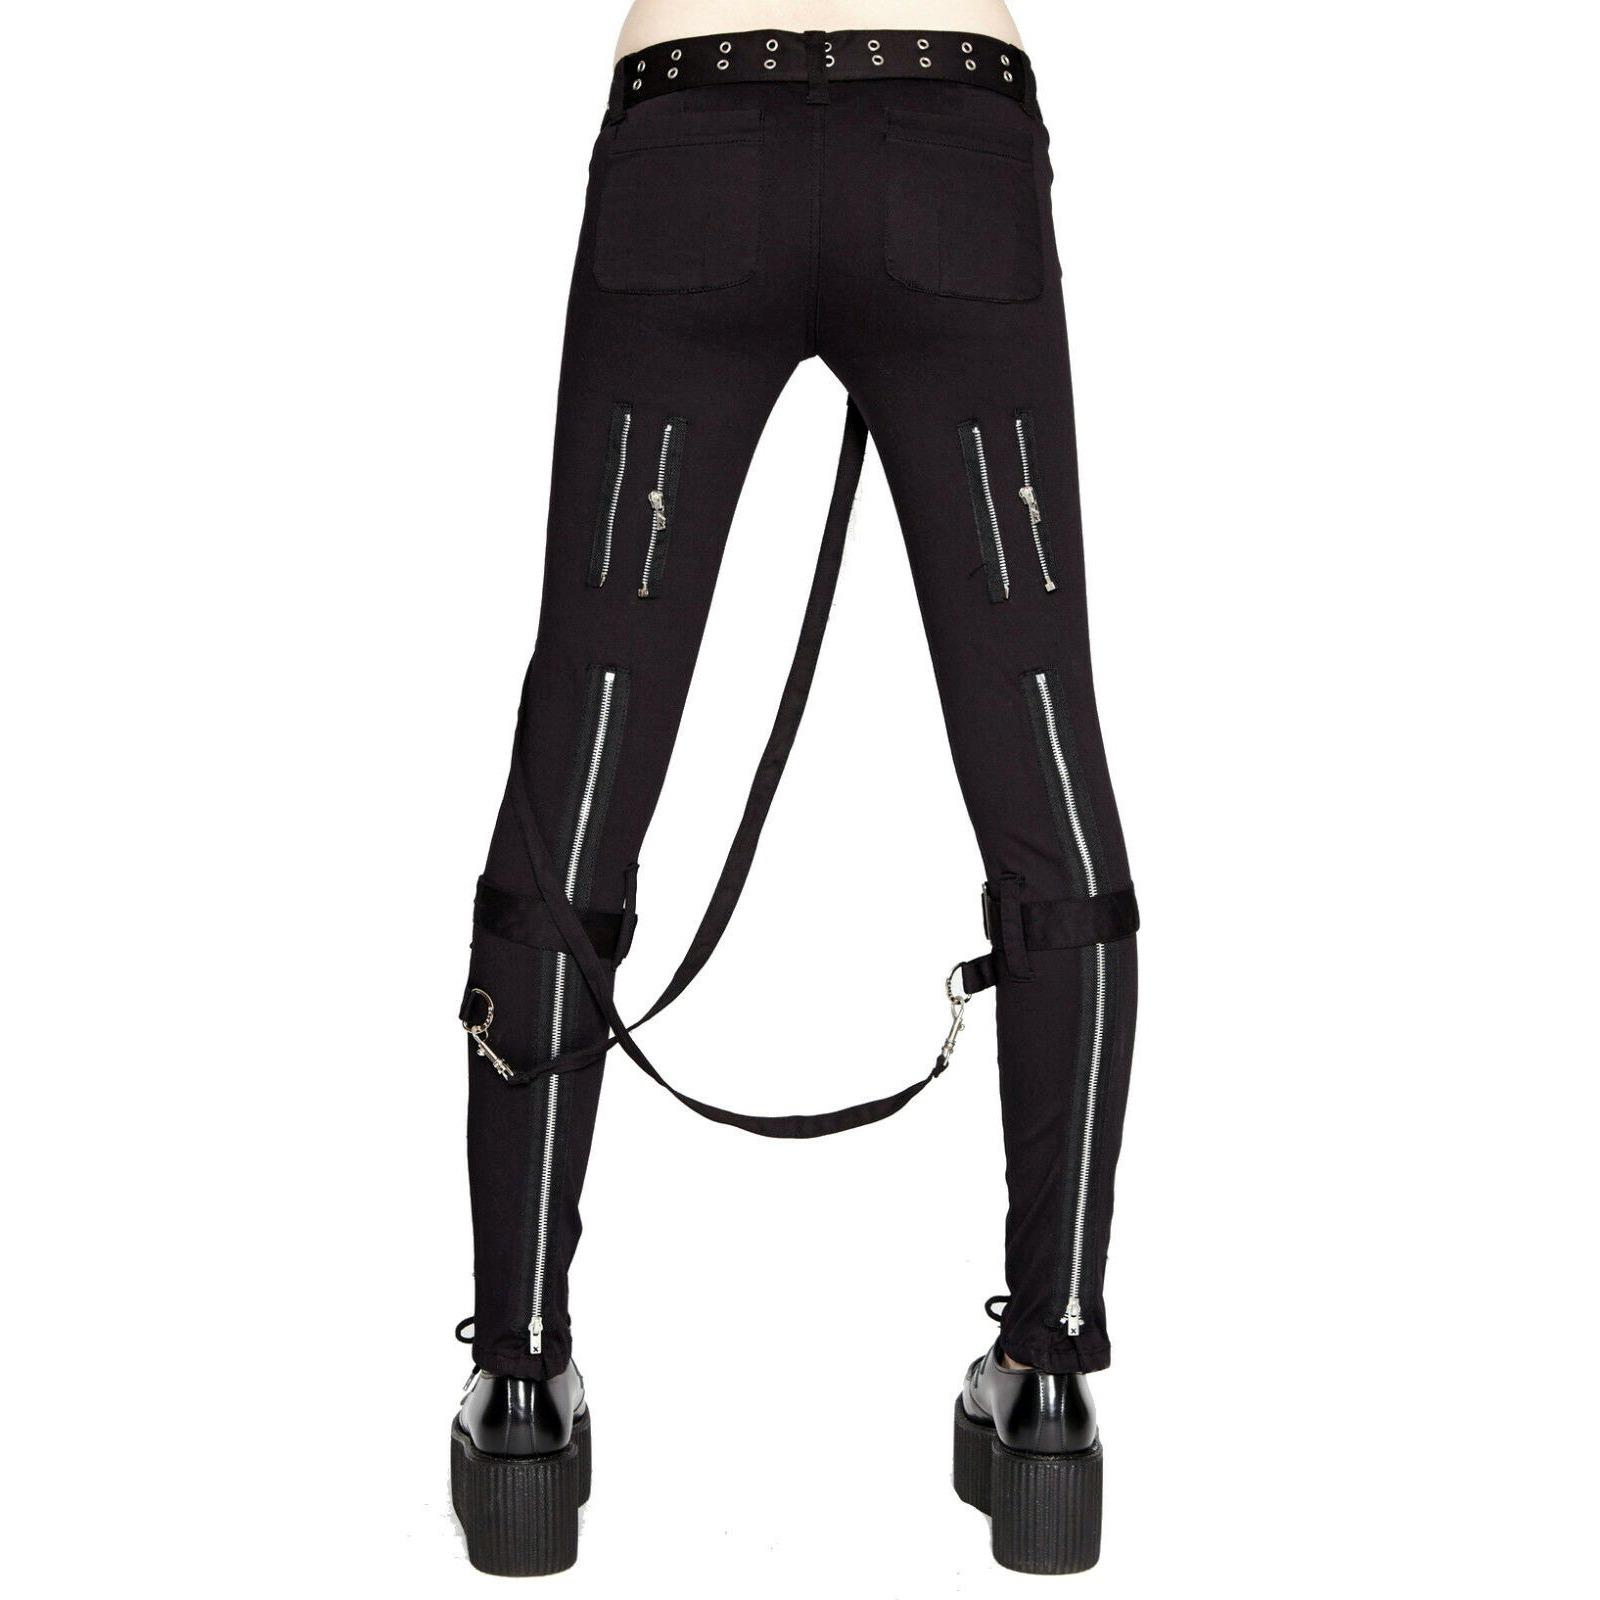 Women's GOTHIC PUNK EMO BONDAGE BLACK STRAPS GOTH ZIPPER ROCK STAR TRIPP PANTS (1)